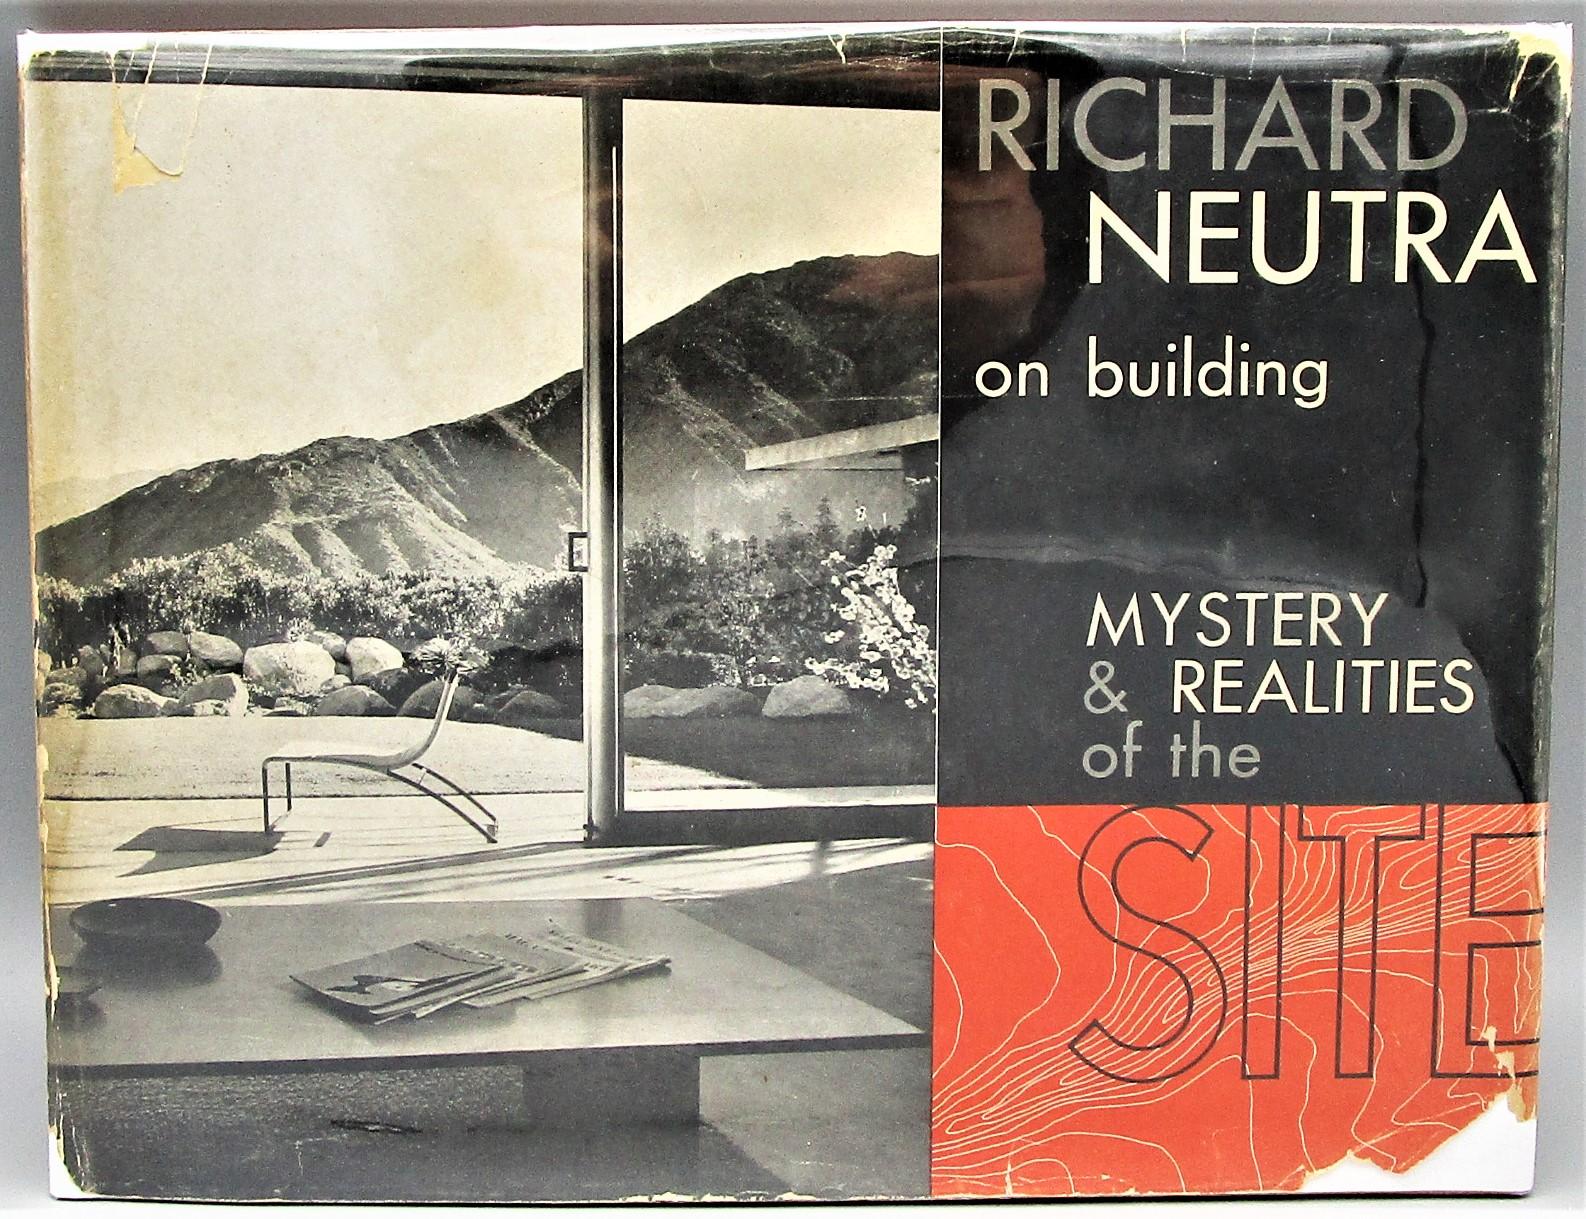 RICHARD NEUTRA ON BUILDING - 1951 [1st Ed]